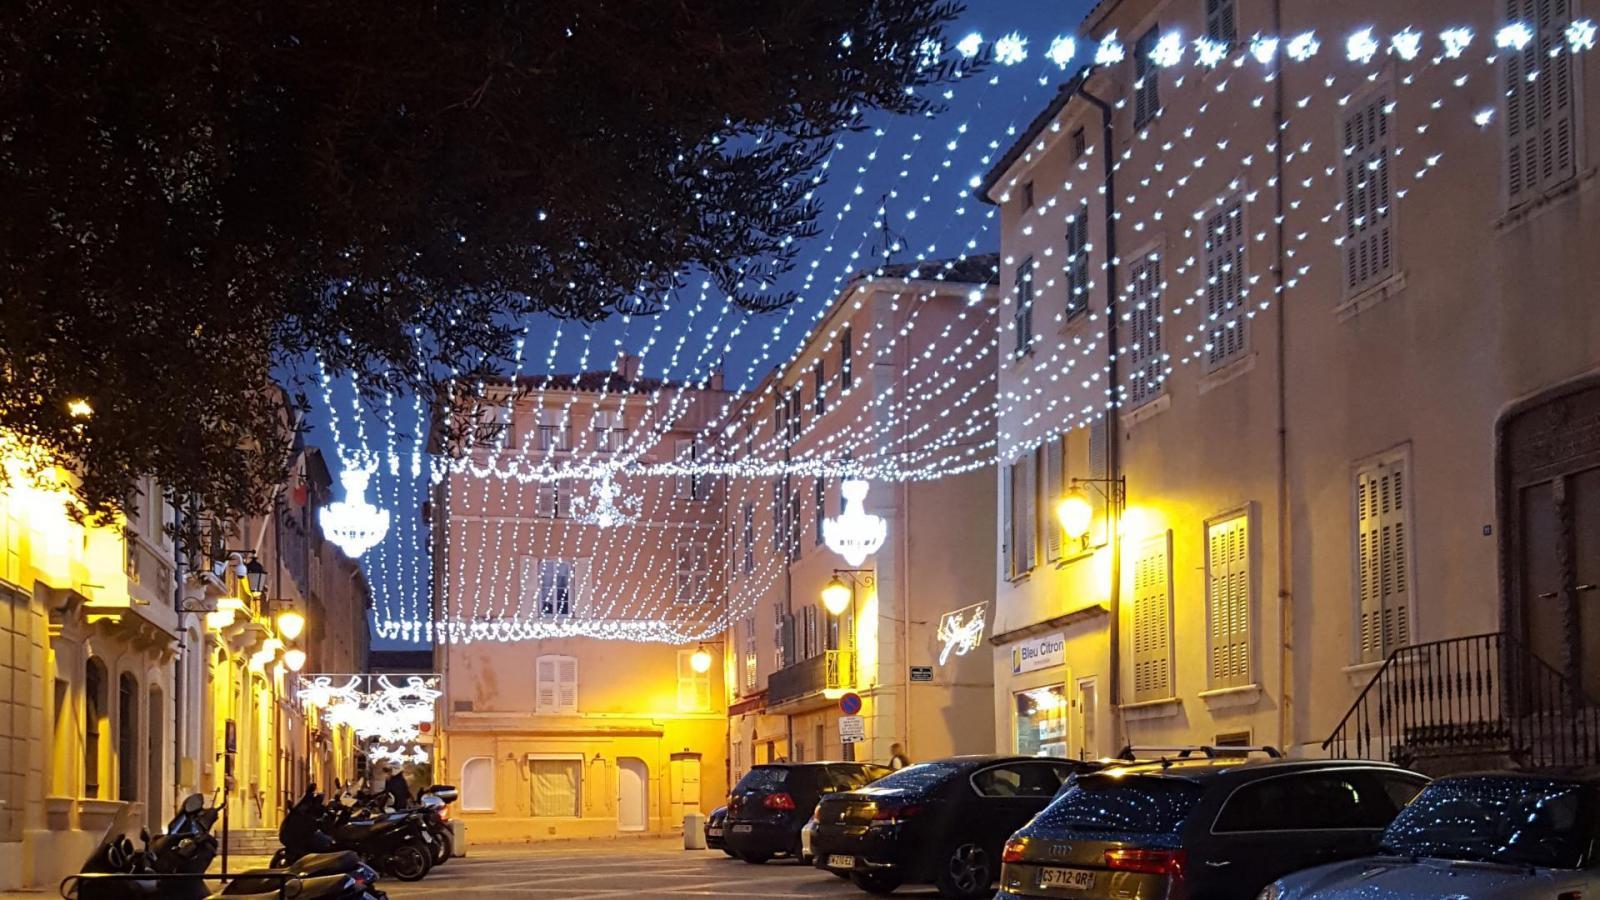 Christmas in Saint Tropez